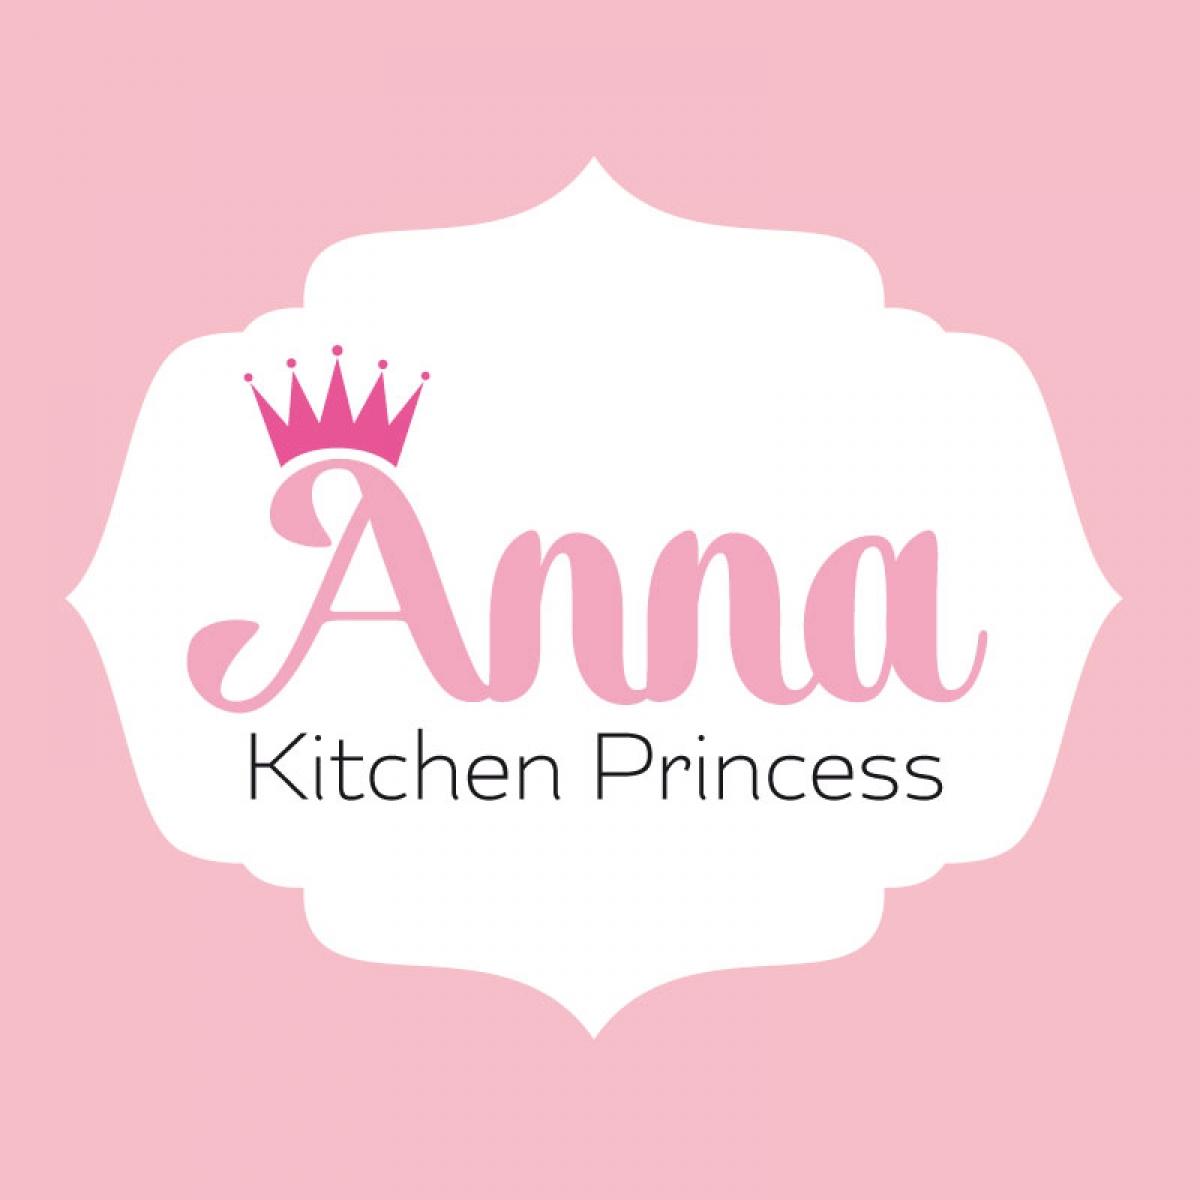 personalisierte kindersch rze kitchen princess casa di falcone. Black Bedroom Furniture Sets. Home Design Ideas